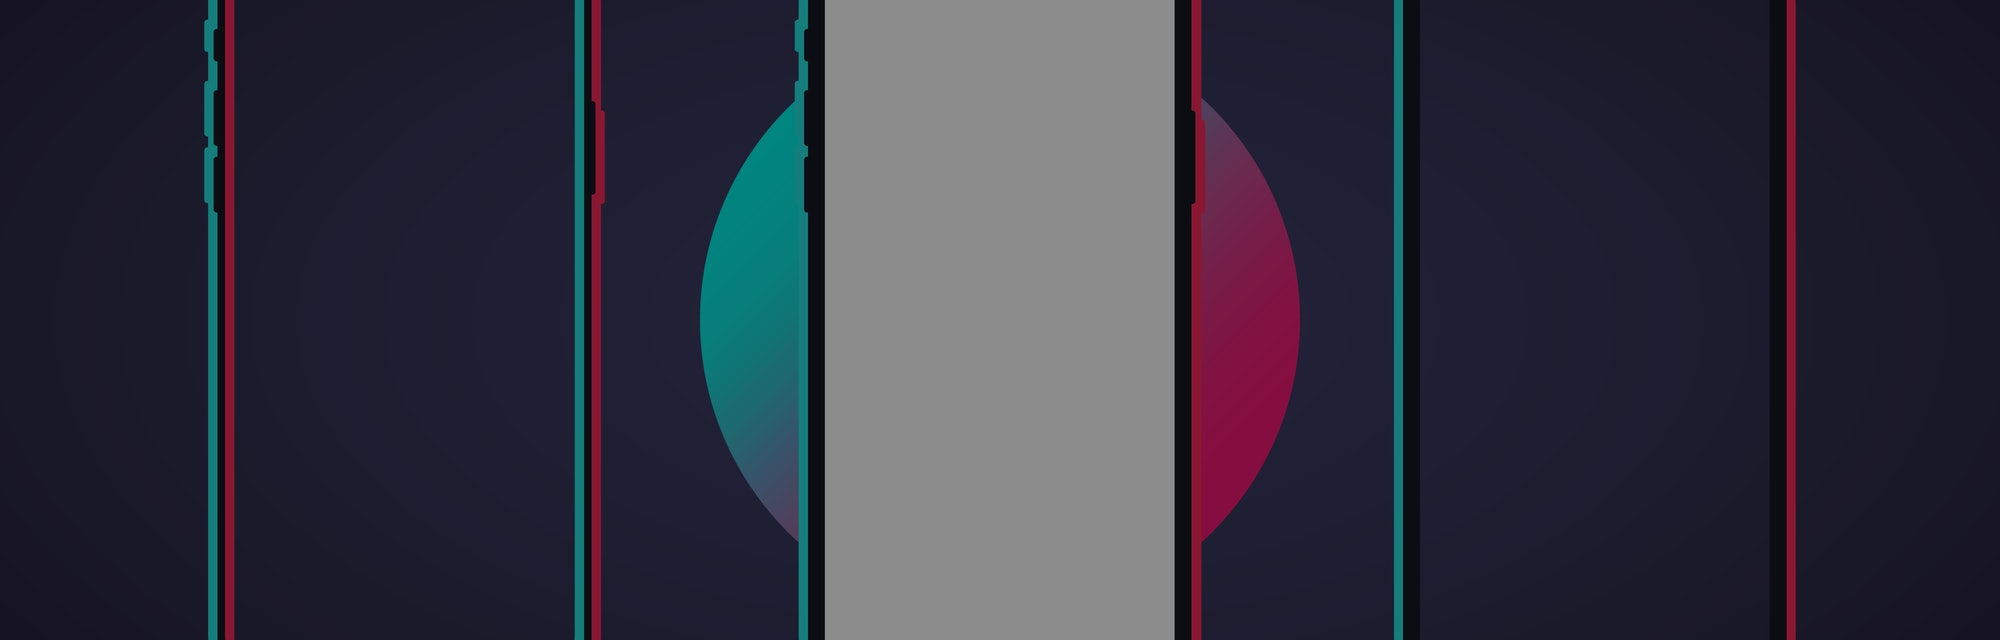 Mockups of colorful frames of the device, smartphone, mobile. Social media concept. Vector illustration. EPS 10